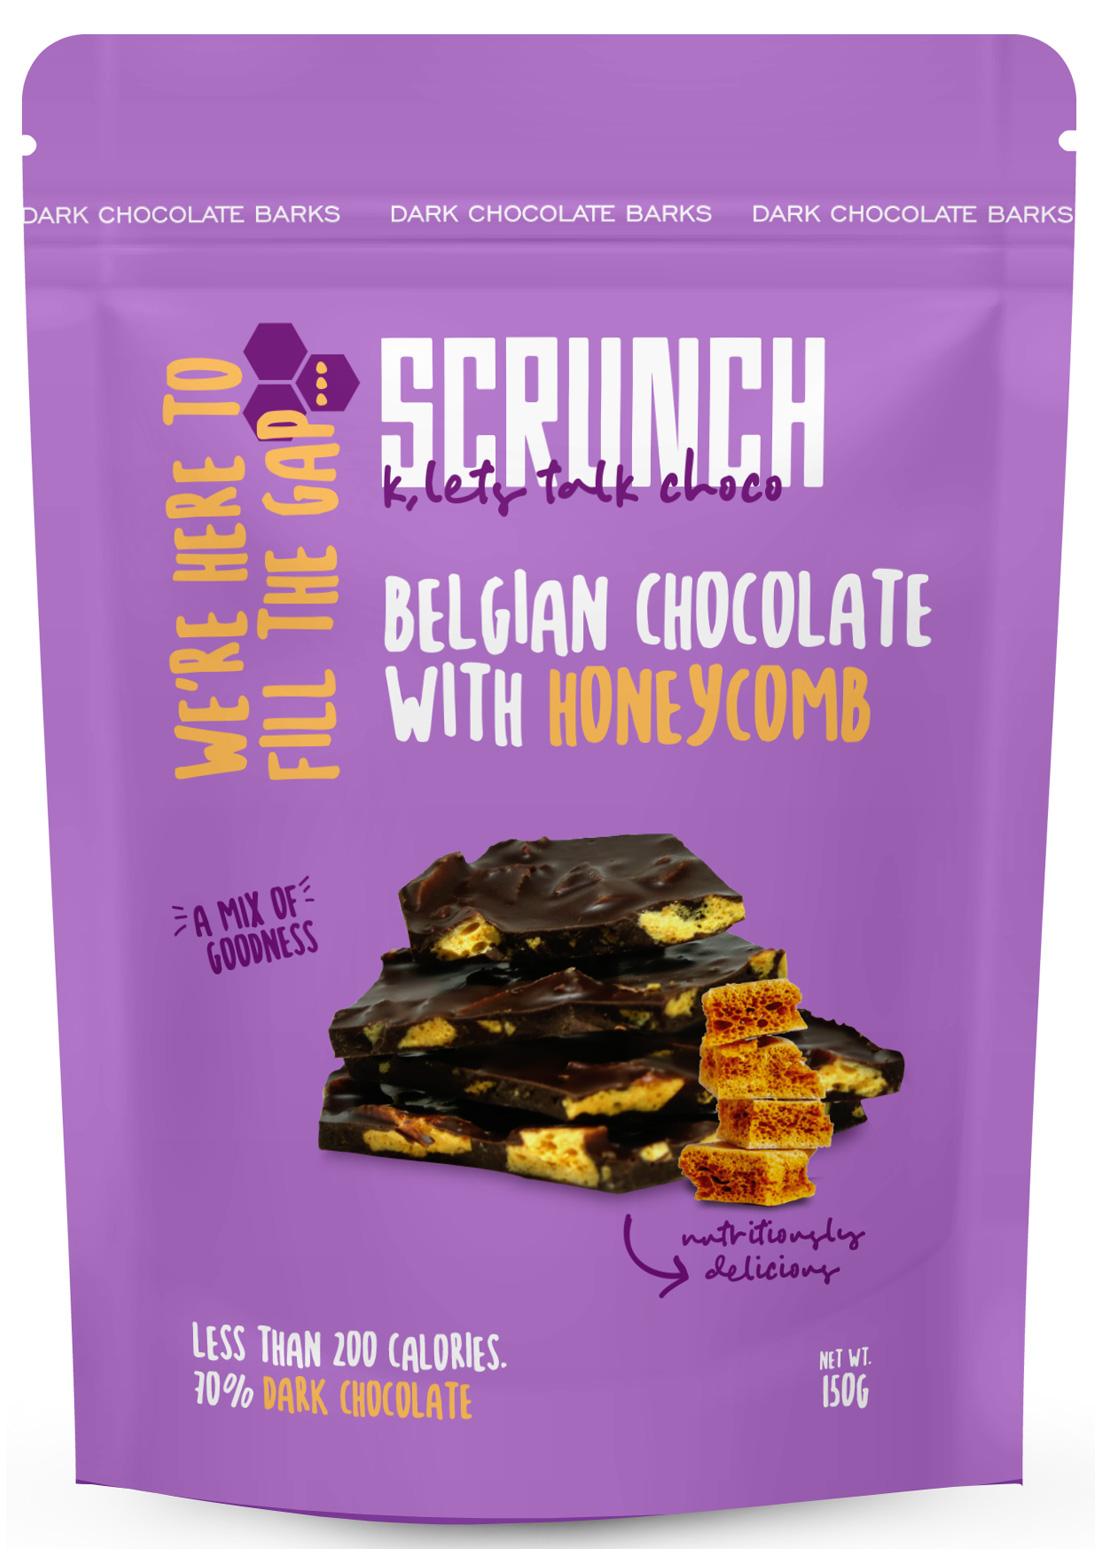 Belgian Dark Chocolate Barks with Honeycomb 191 slide